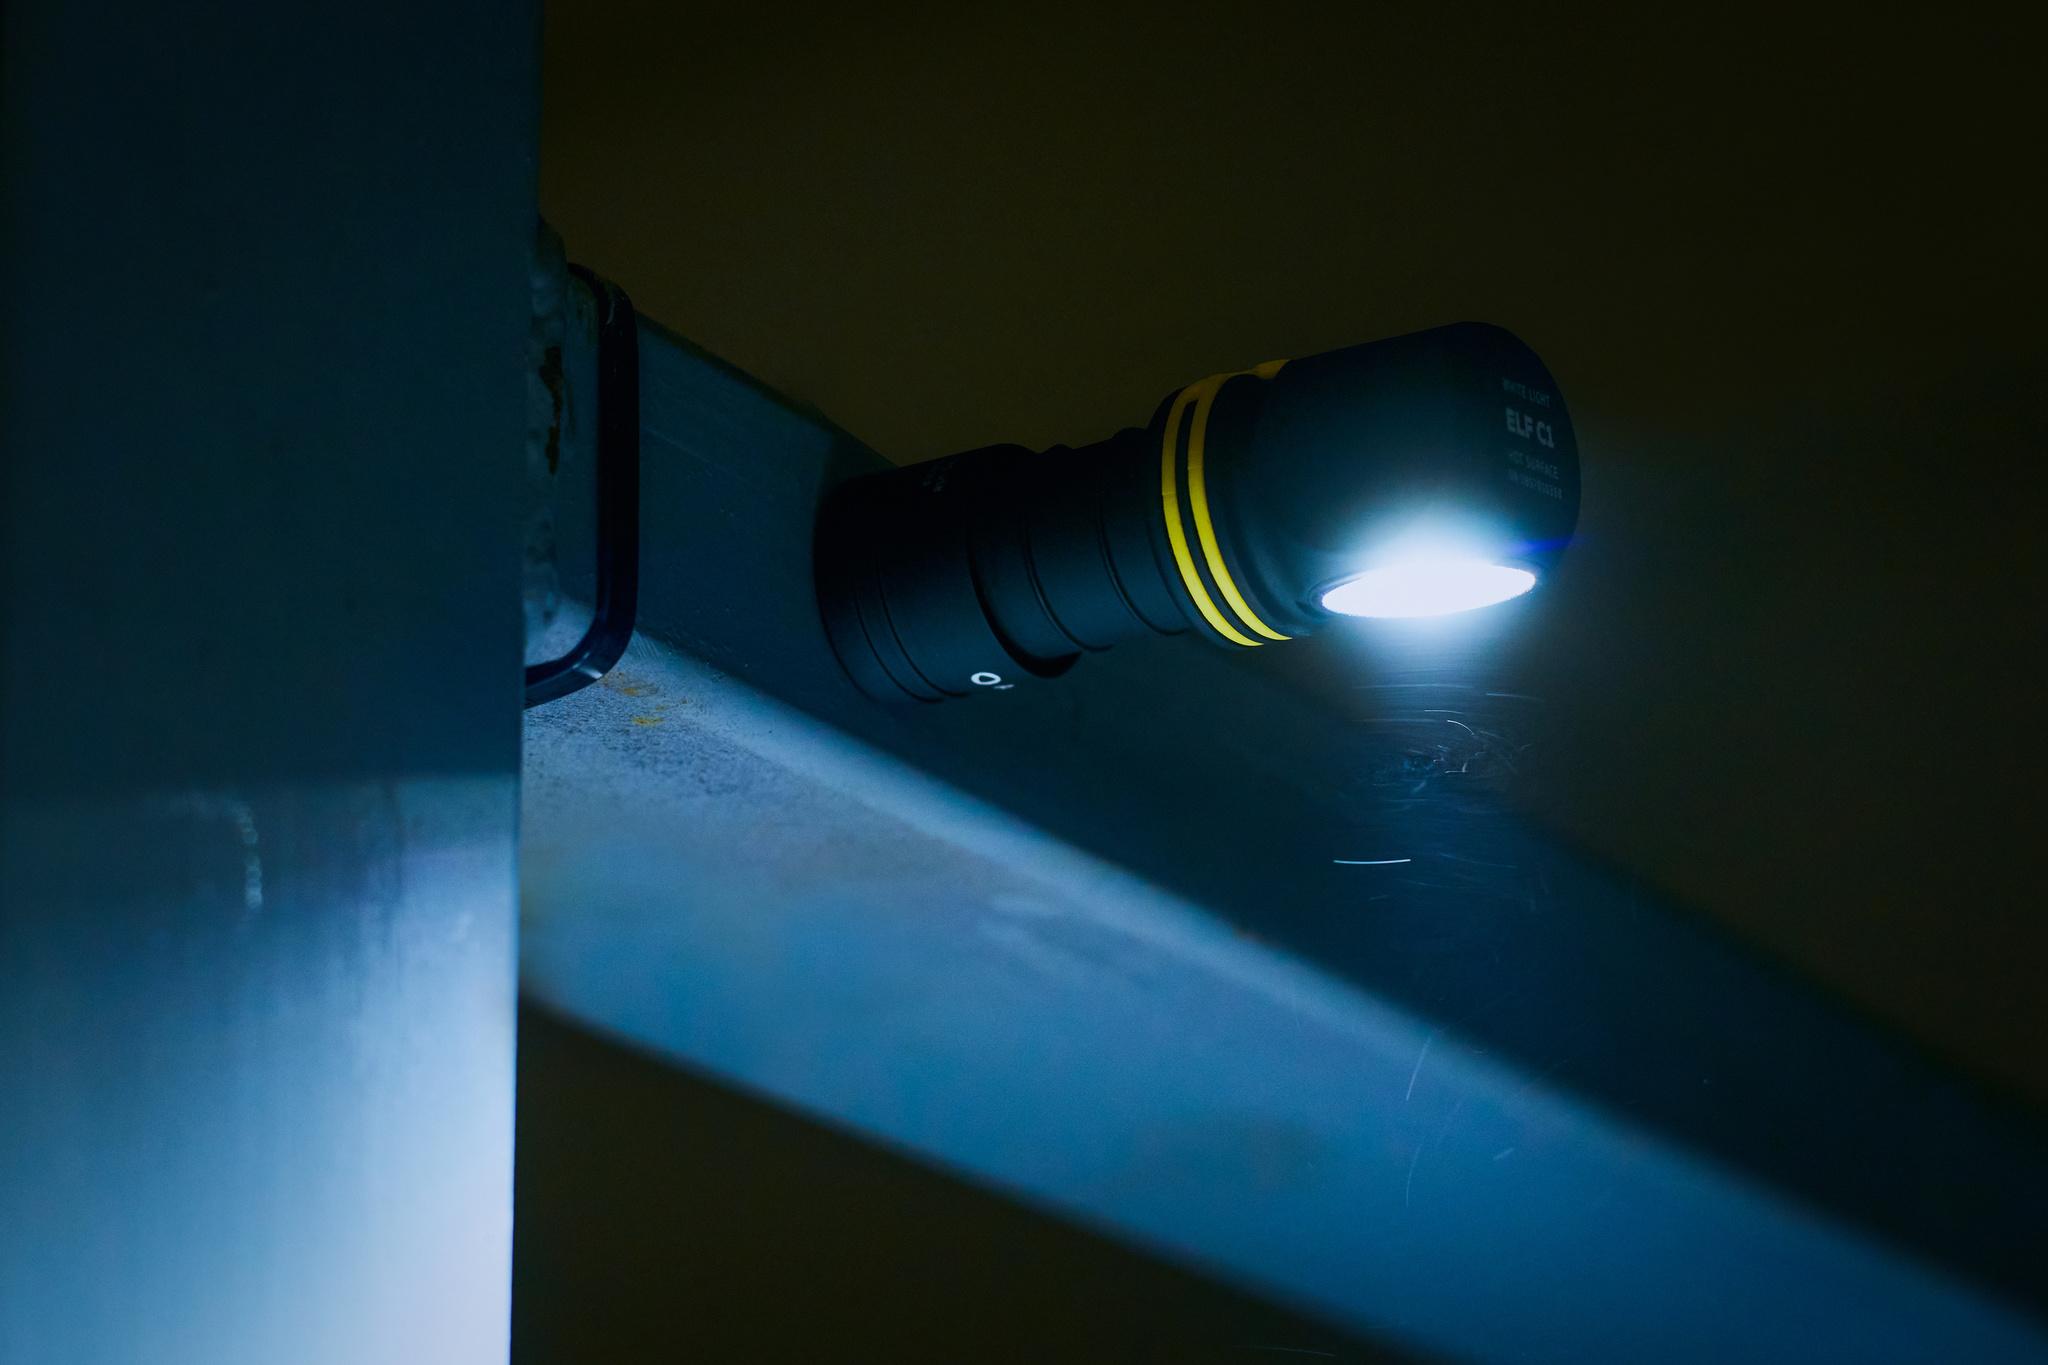 Мультифонарь Armytek Elf C1 Micro USB (теплый свет) - фото 6